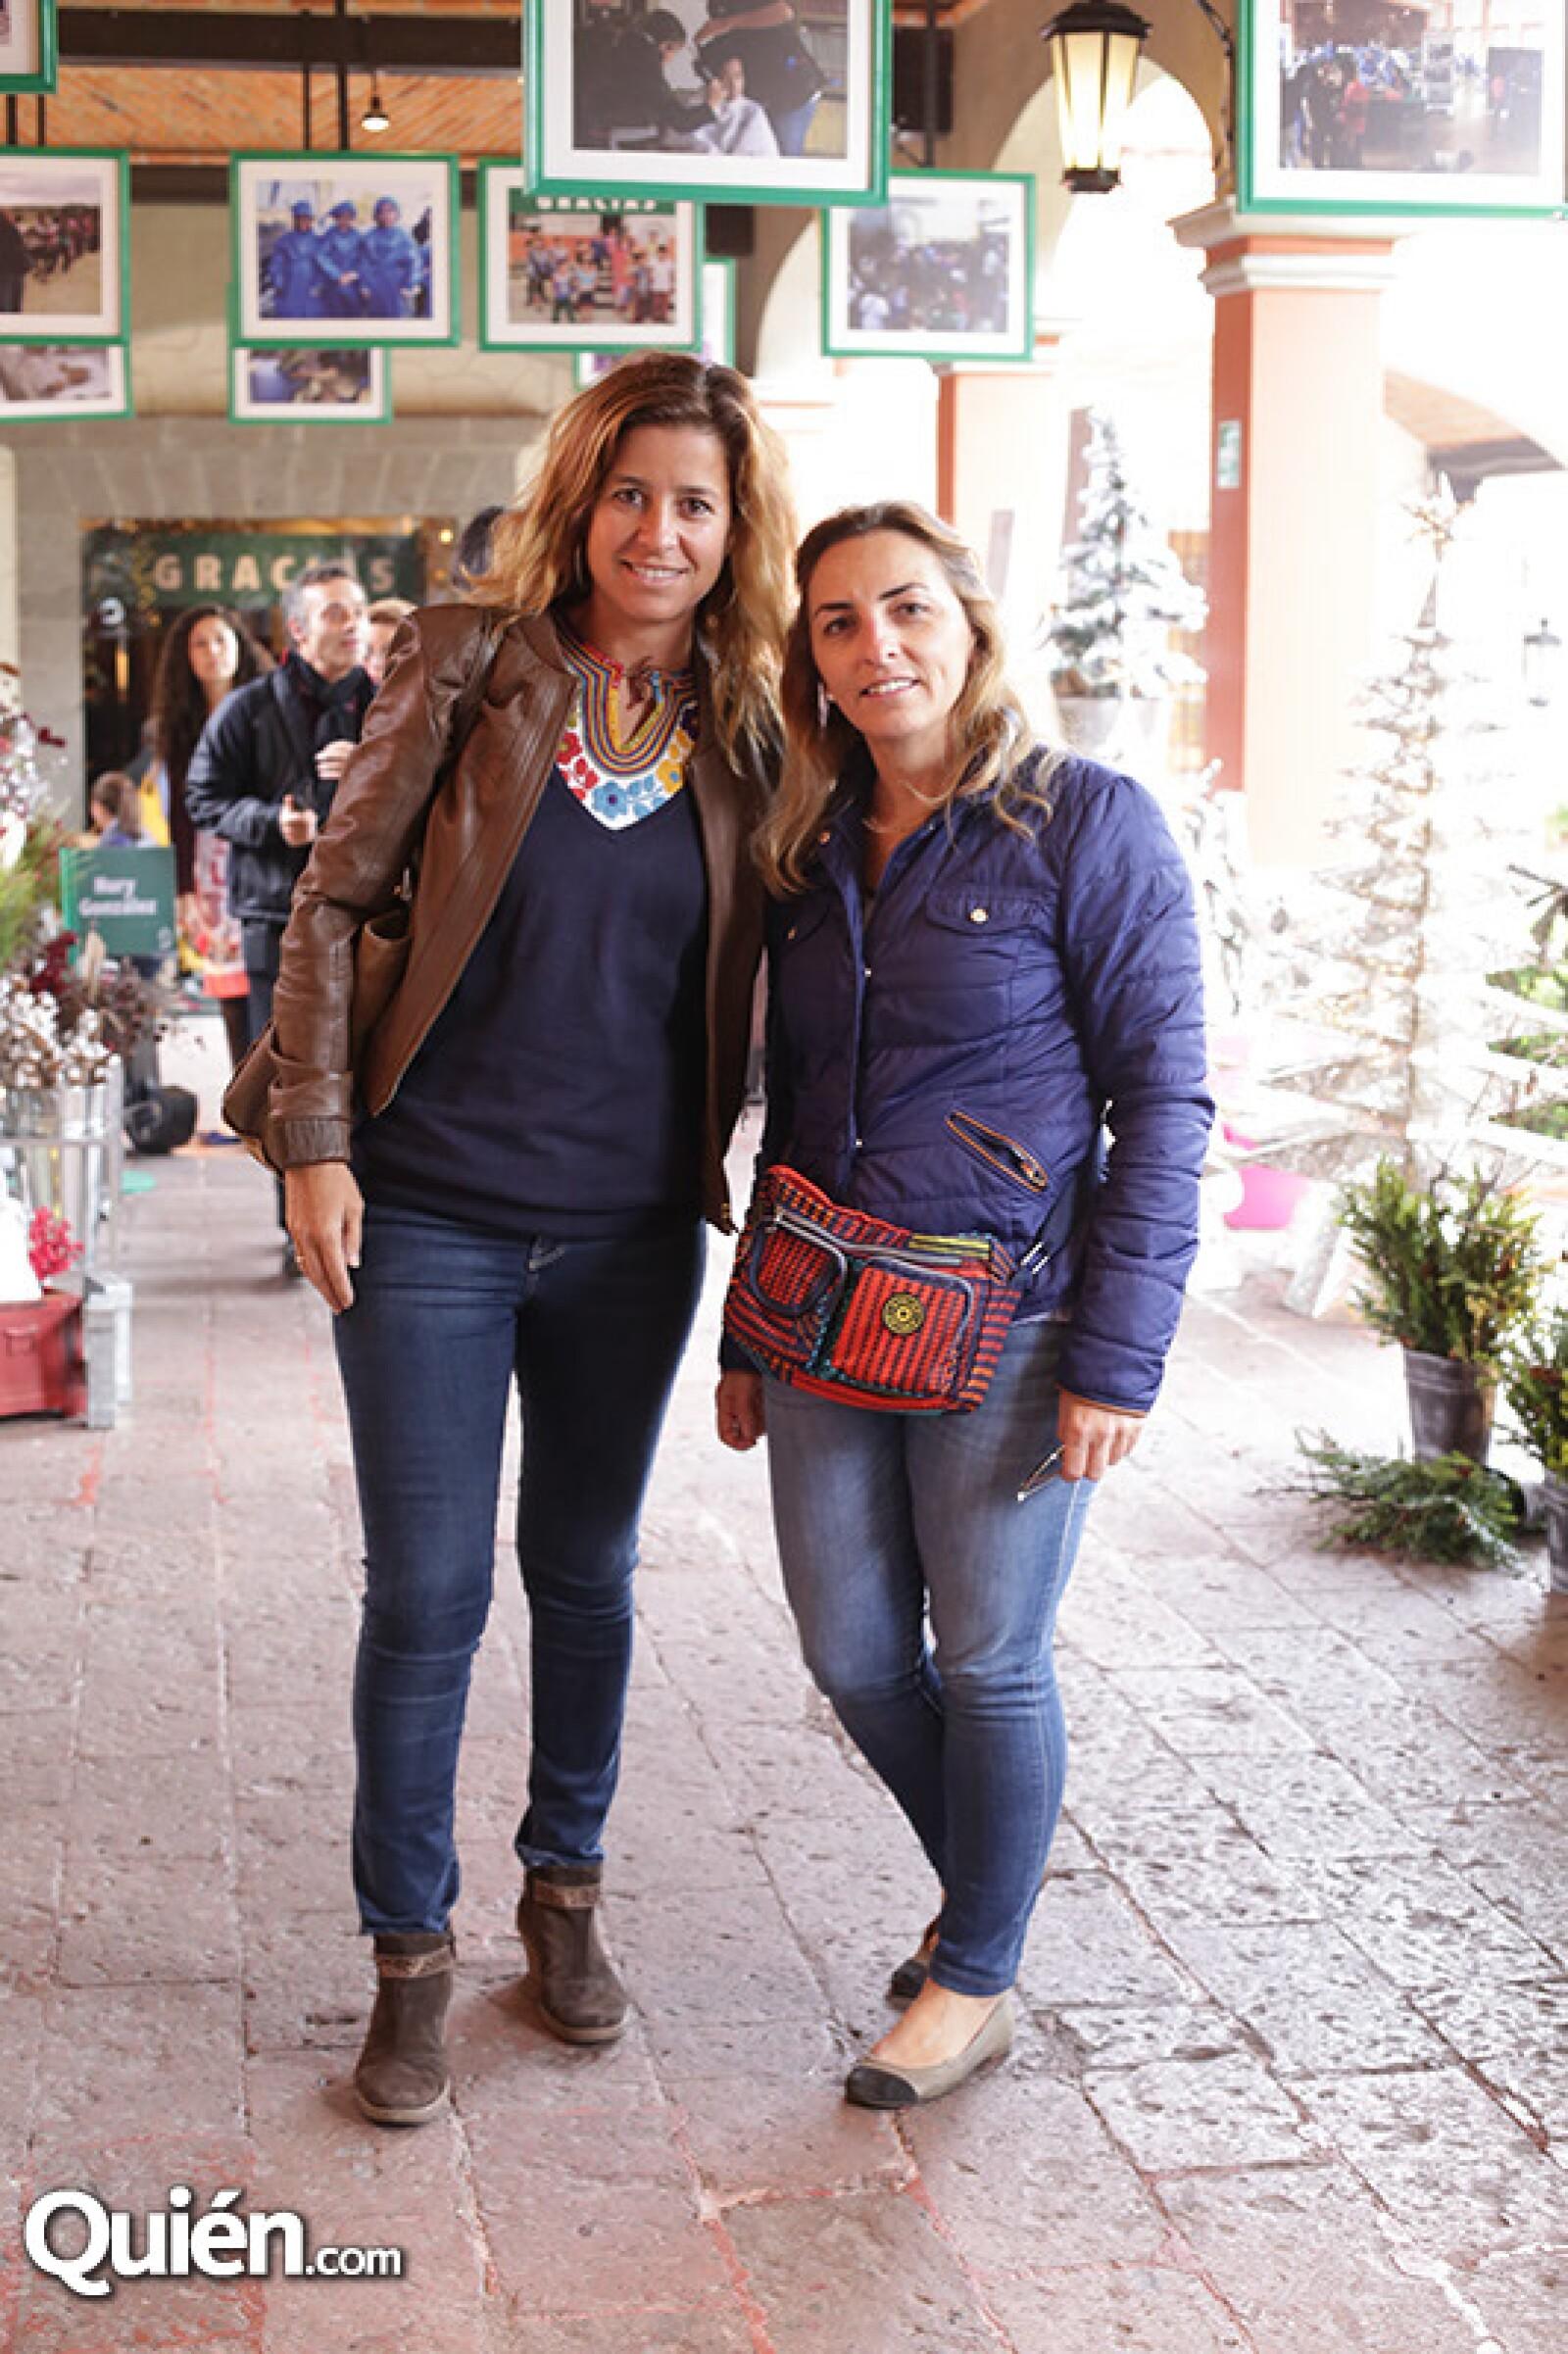 Ana Sierra y Mónia Villafruela